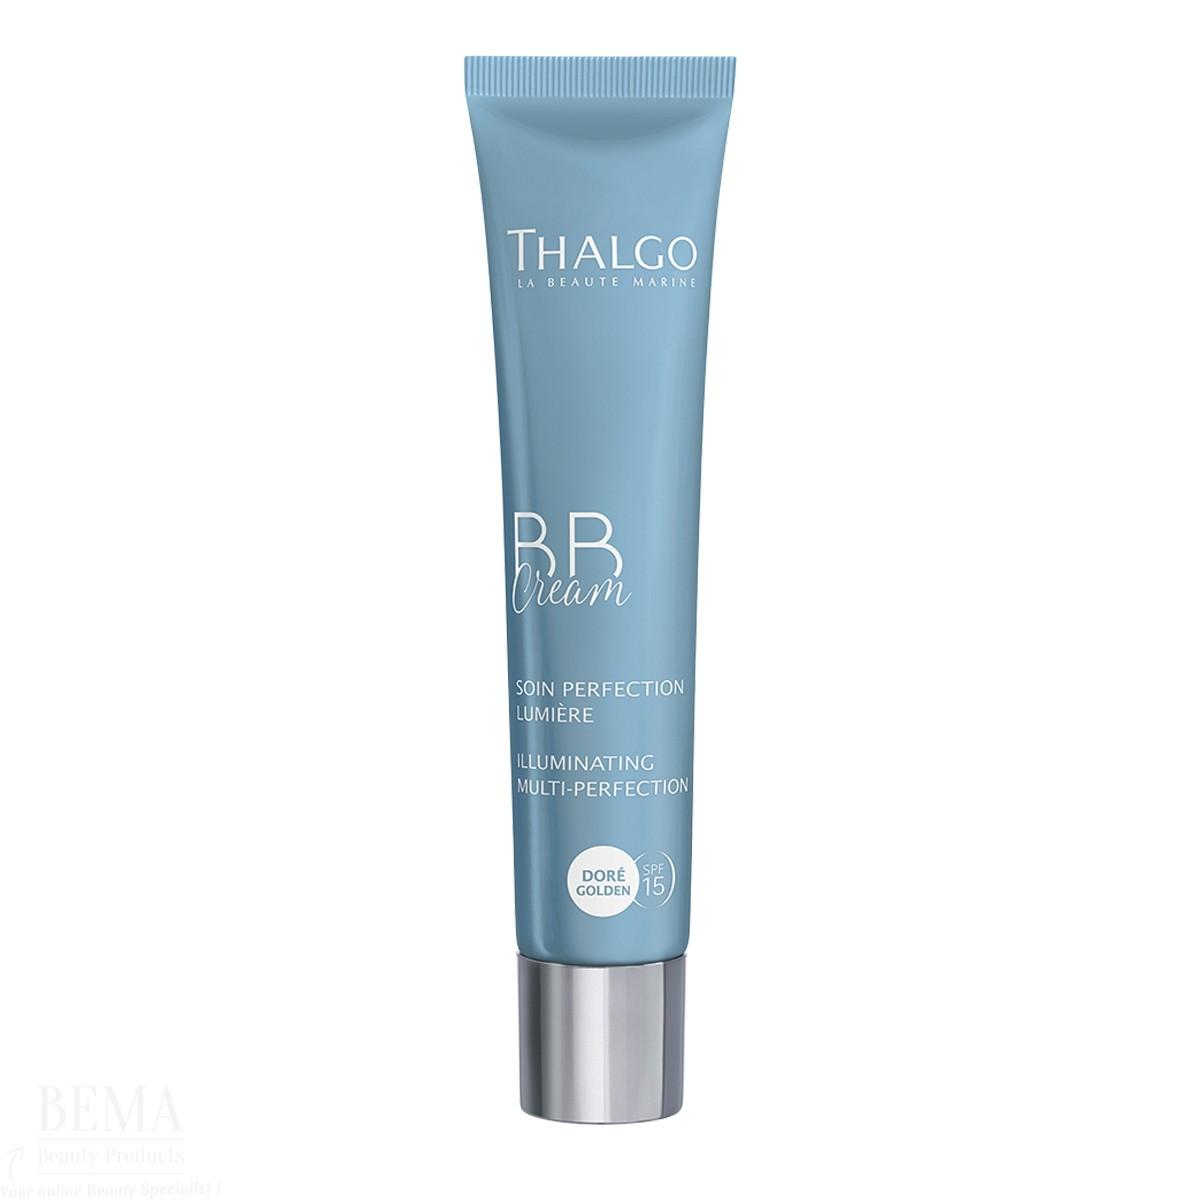 Thalgo bb cream soin perfection lumiere dore spf15 40ml